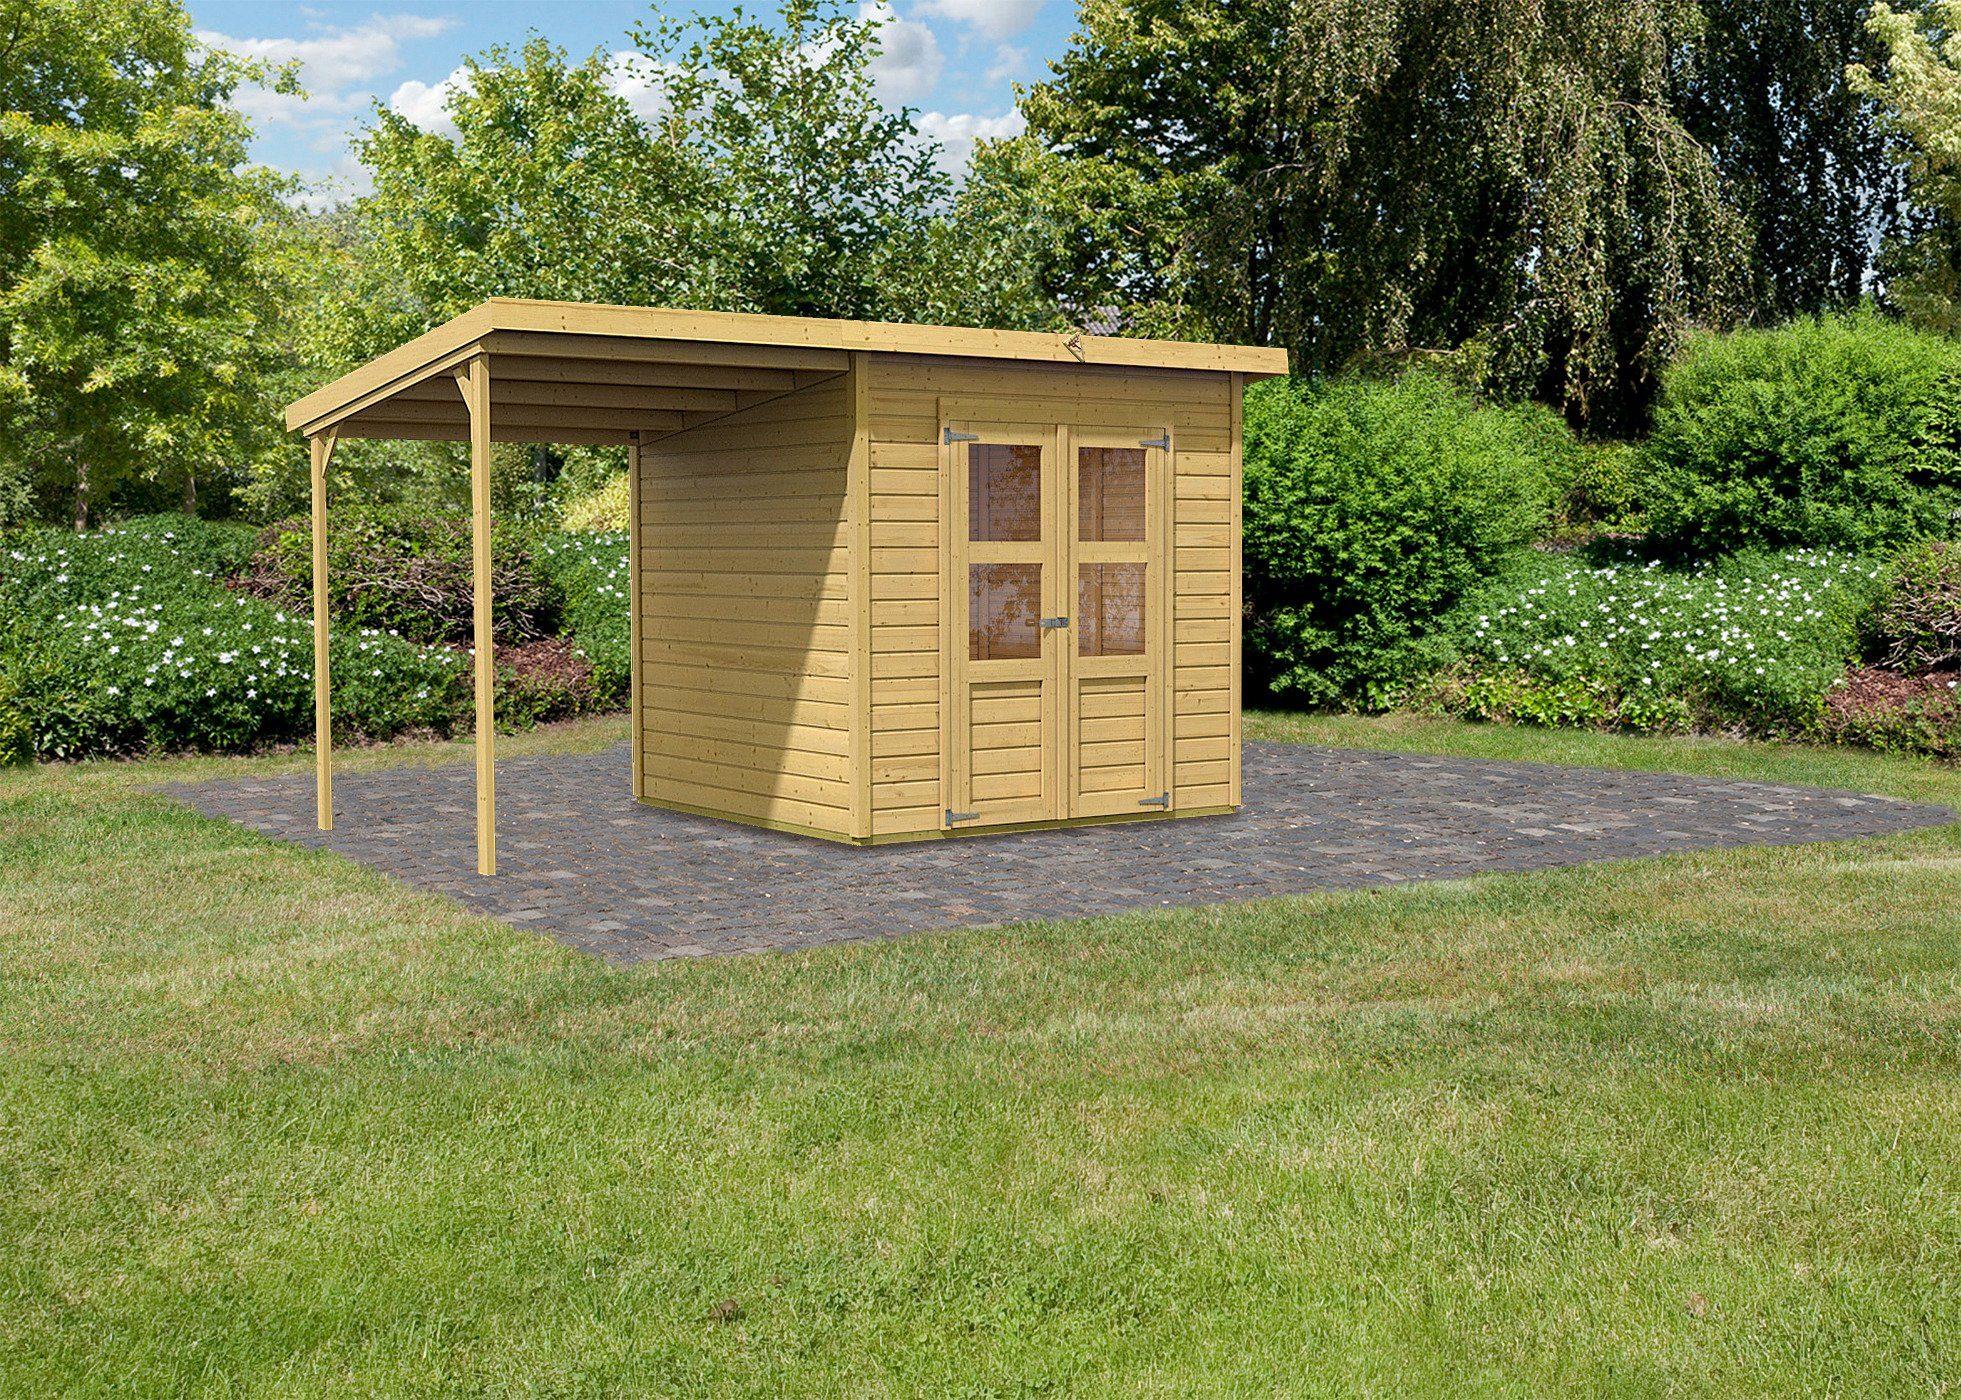 KARIBU Gartenhaus »Moisburg 4«, BxT: 242x214 cm